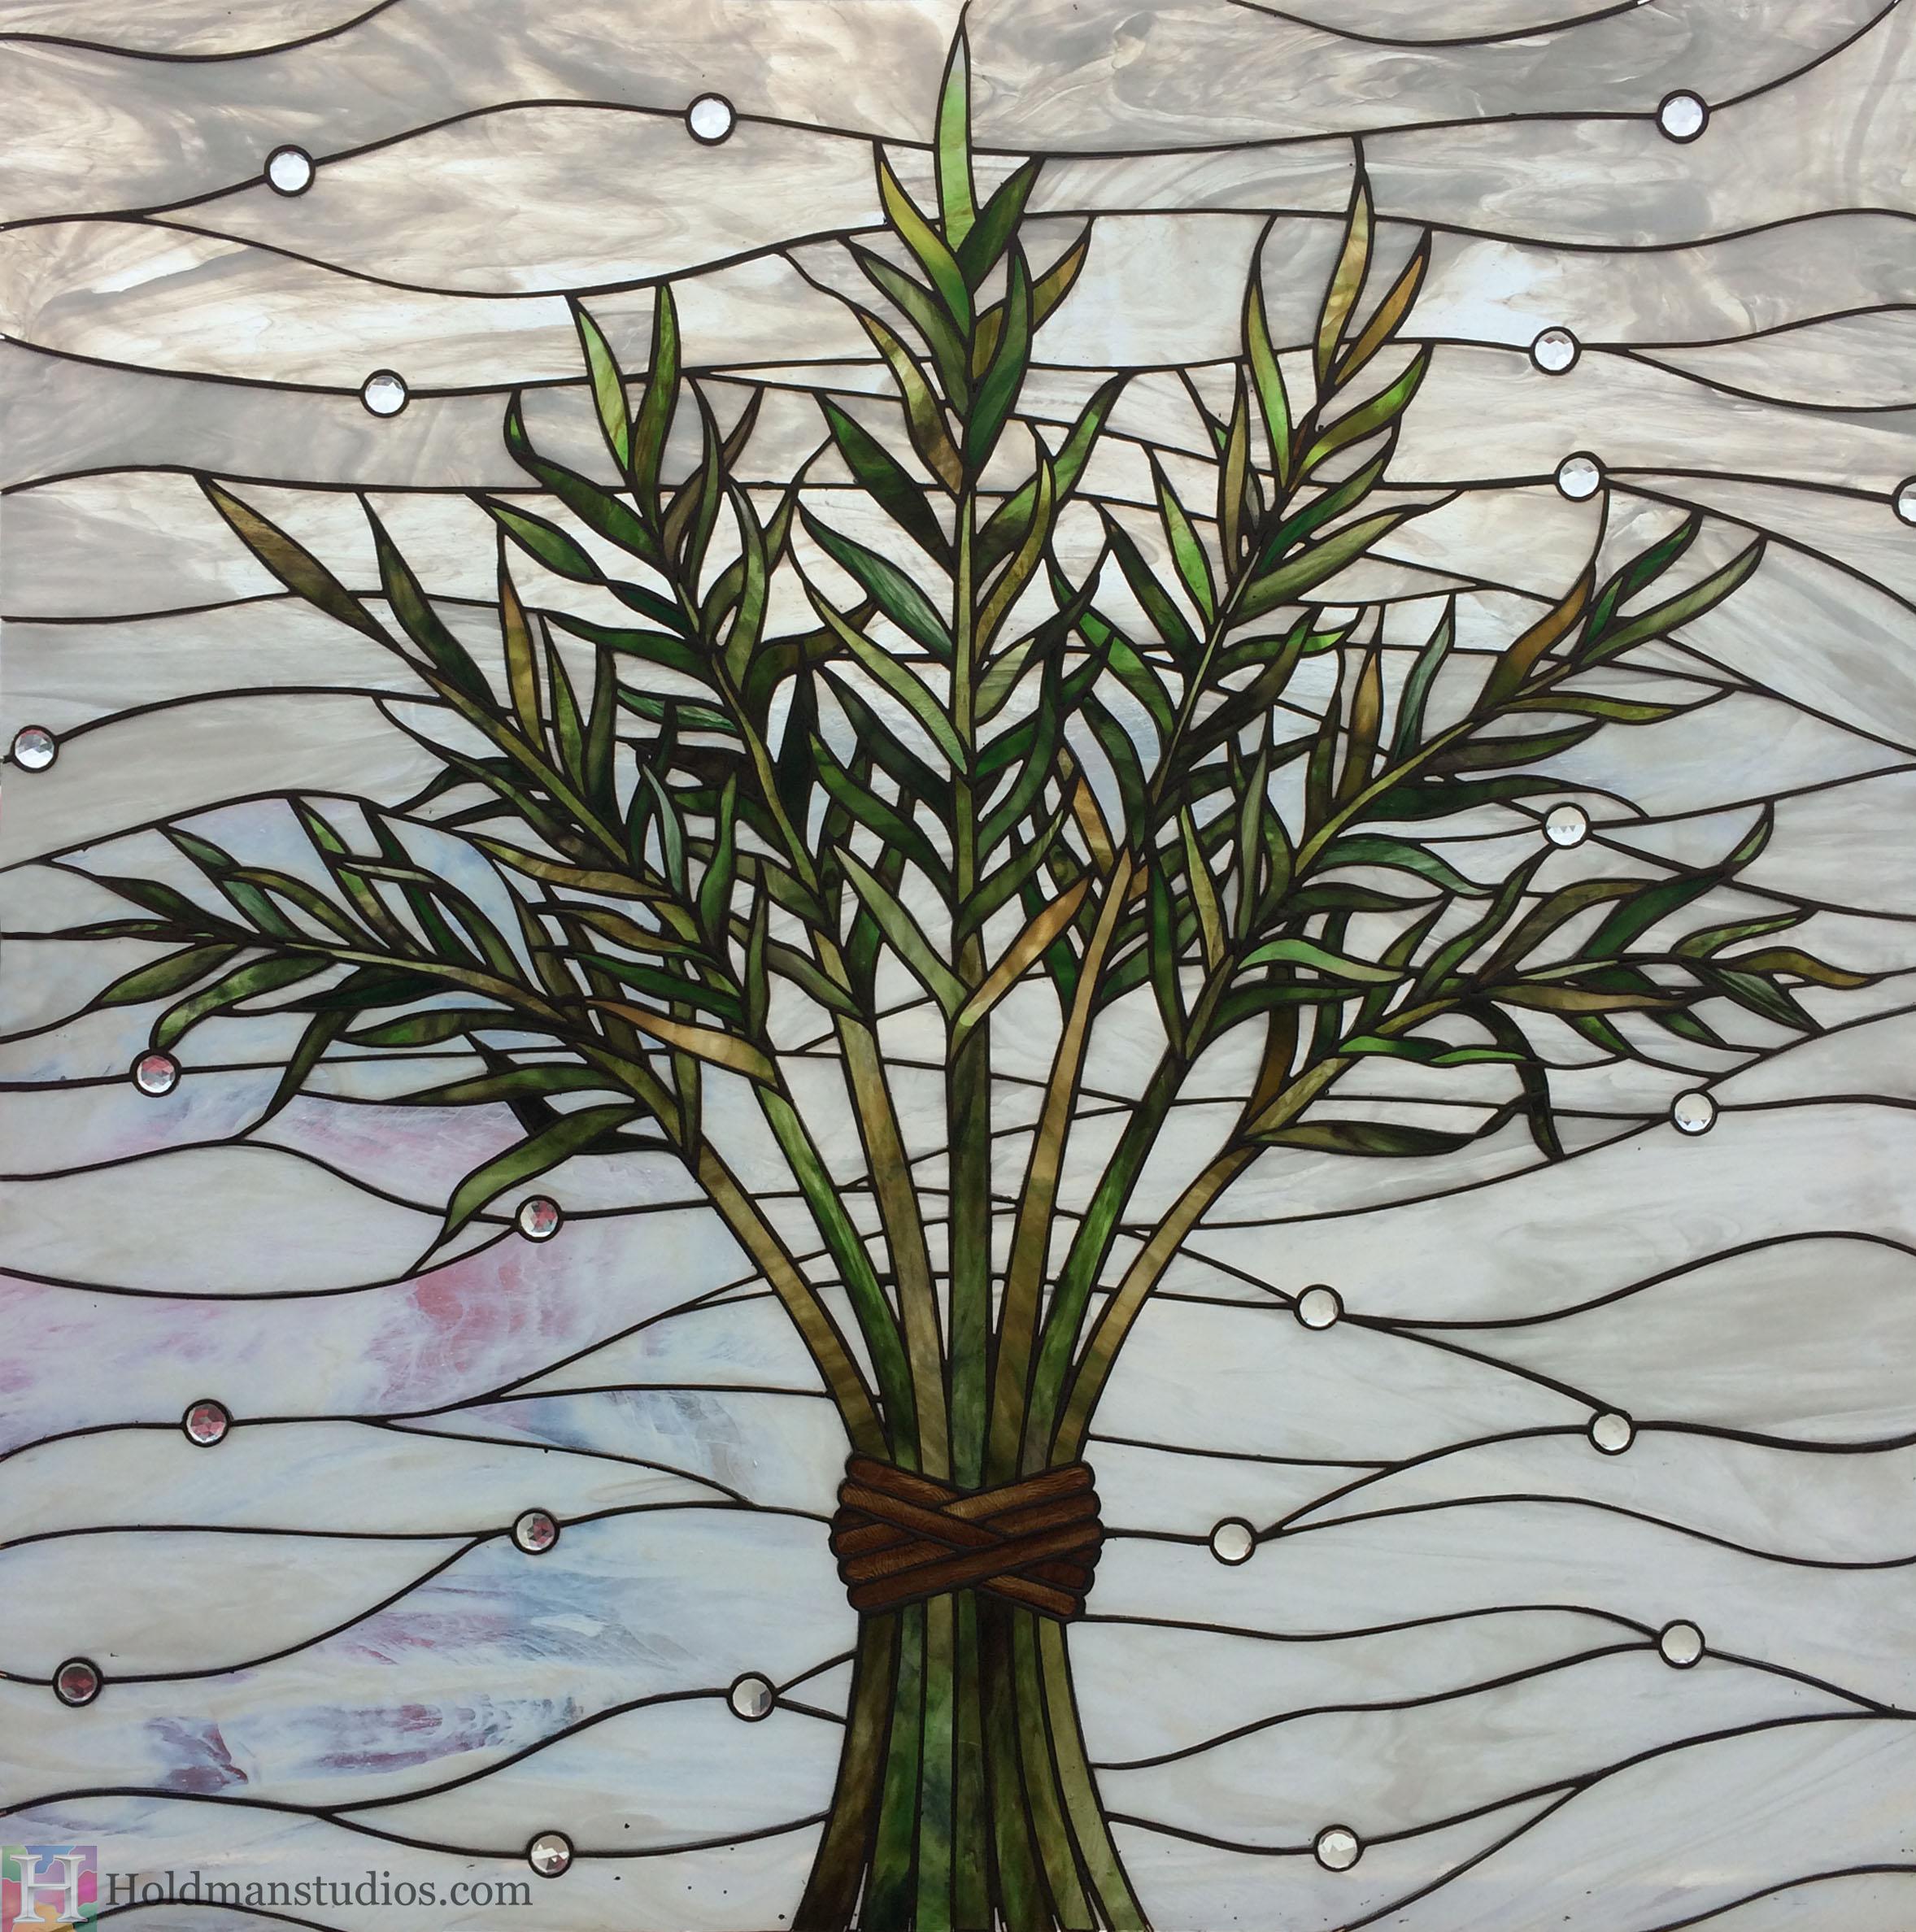 Holdman-Studios-Stained-Glass-Window-Harvest-Branches-Palm-Leaves-Full.jpg